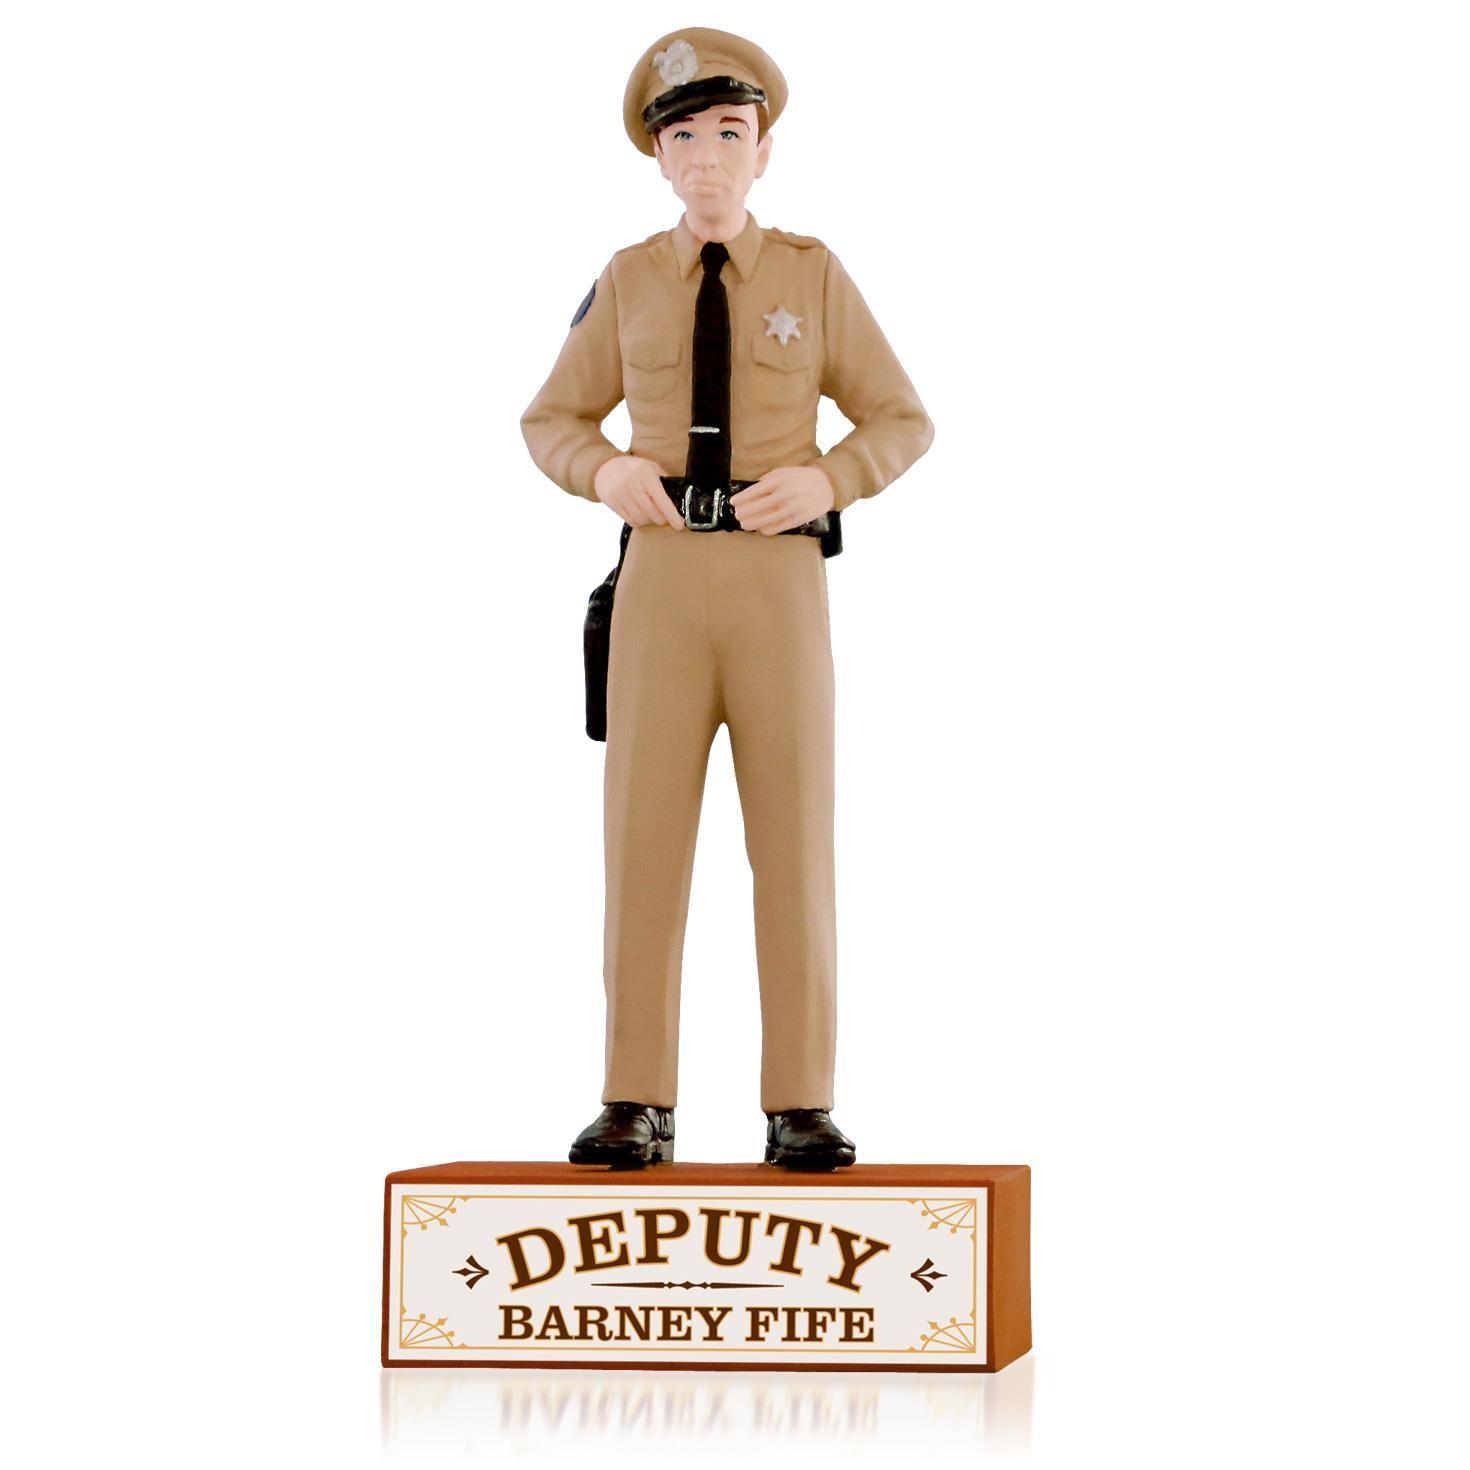 2015 Deputy Barney Fife Hallmark Ornament - Hooked on Hallmark Ornaments